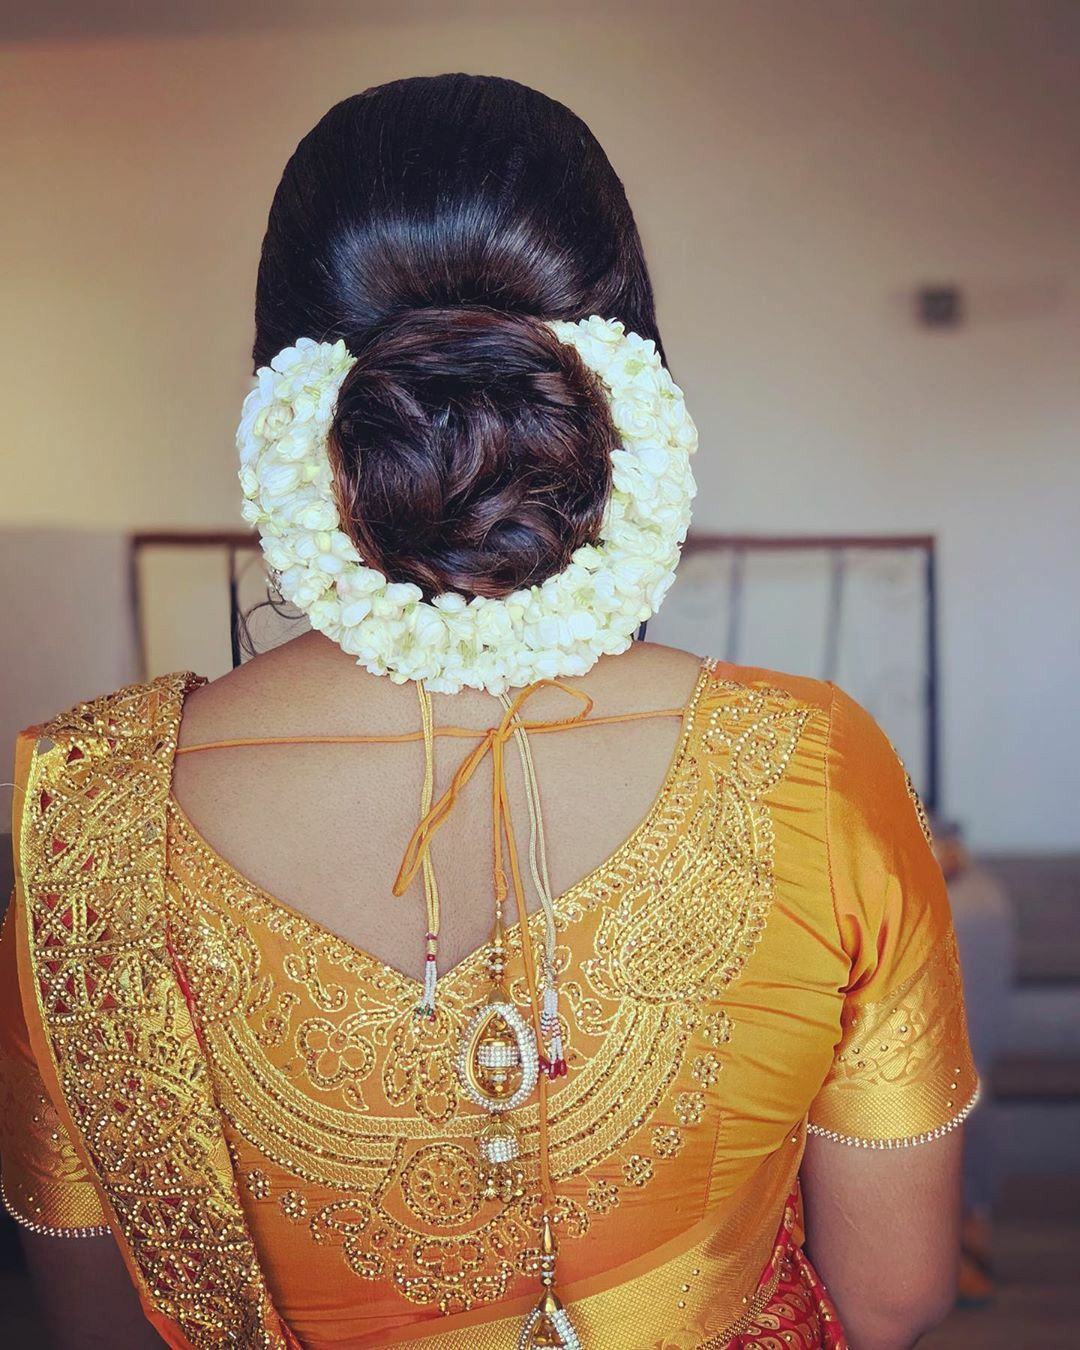 Pin By Pradeep Ray On Gajara Hair Bun In